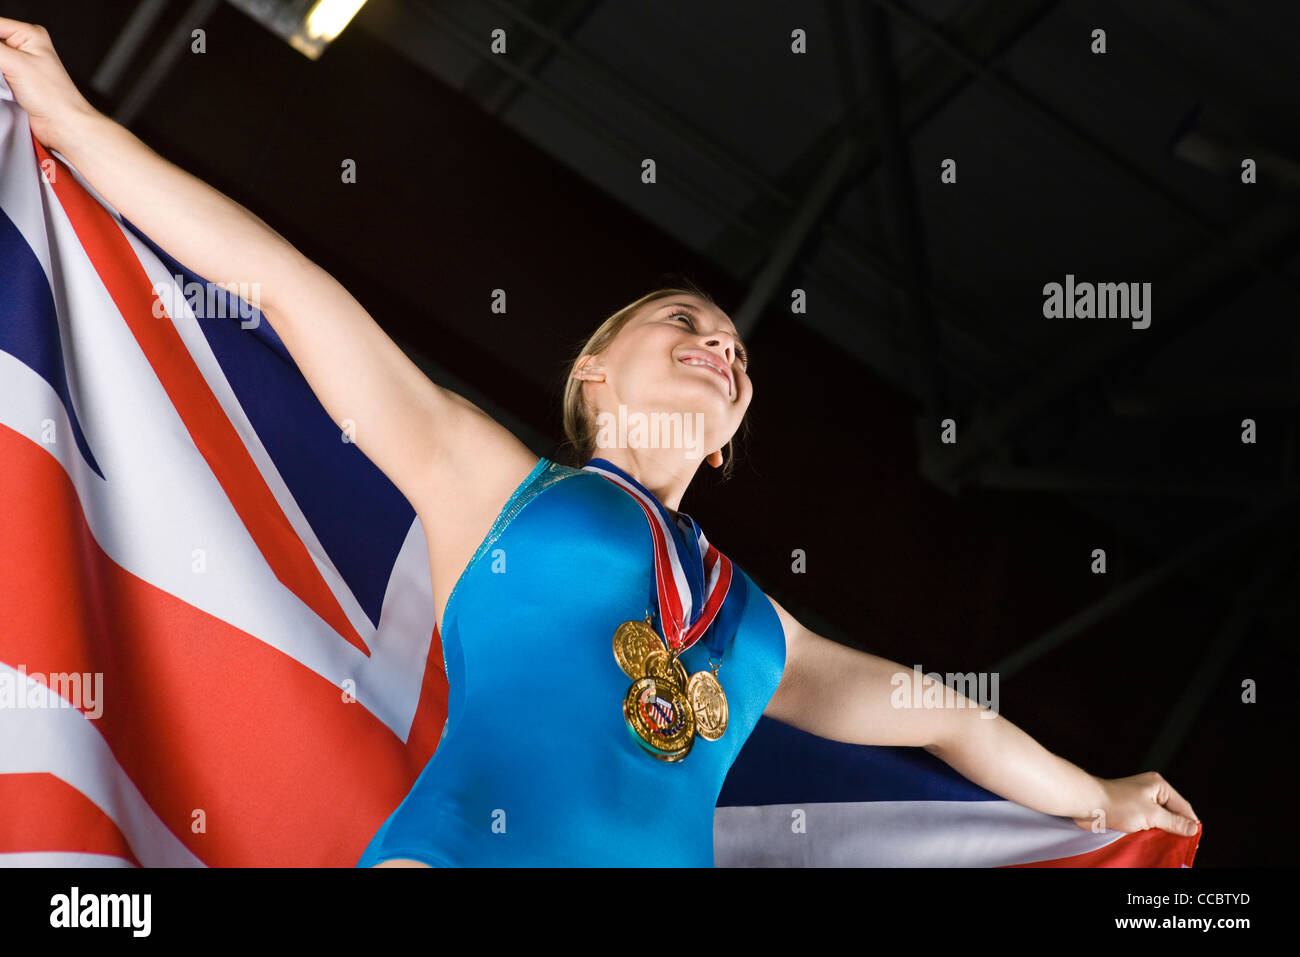 Female gymnastic medalist holding American flag, portrait - Stock Image